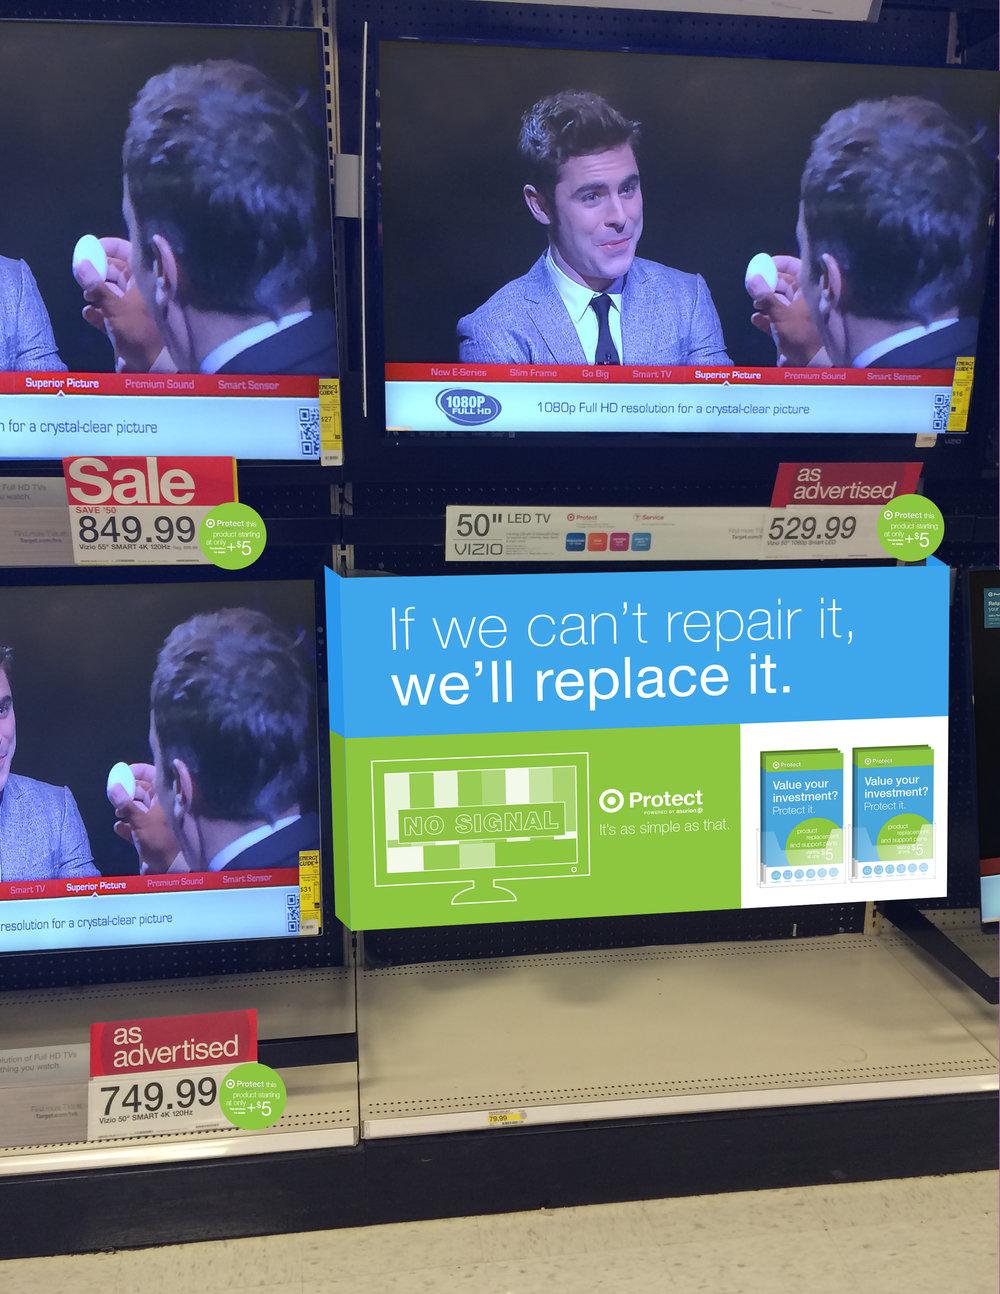 TargetAsurion_POS_Televisions-A2.jpg